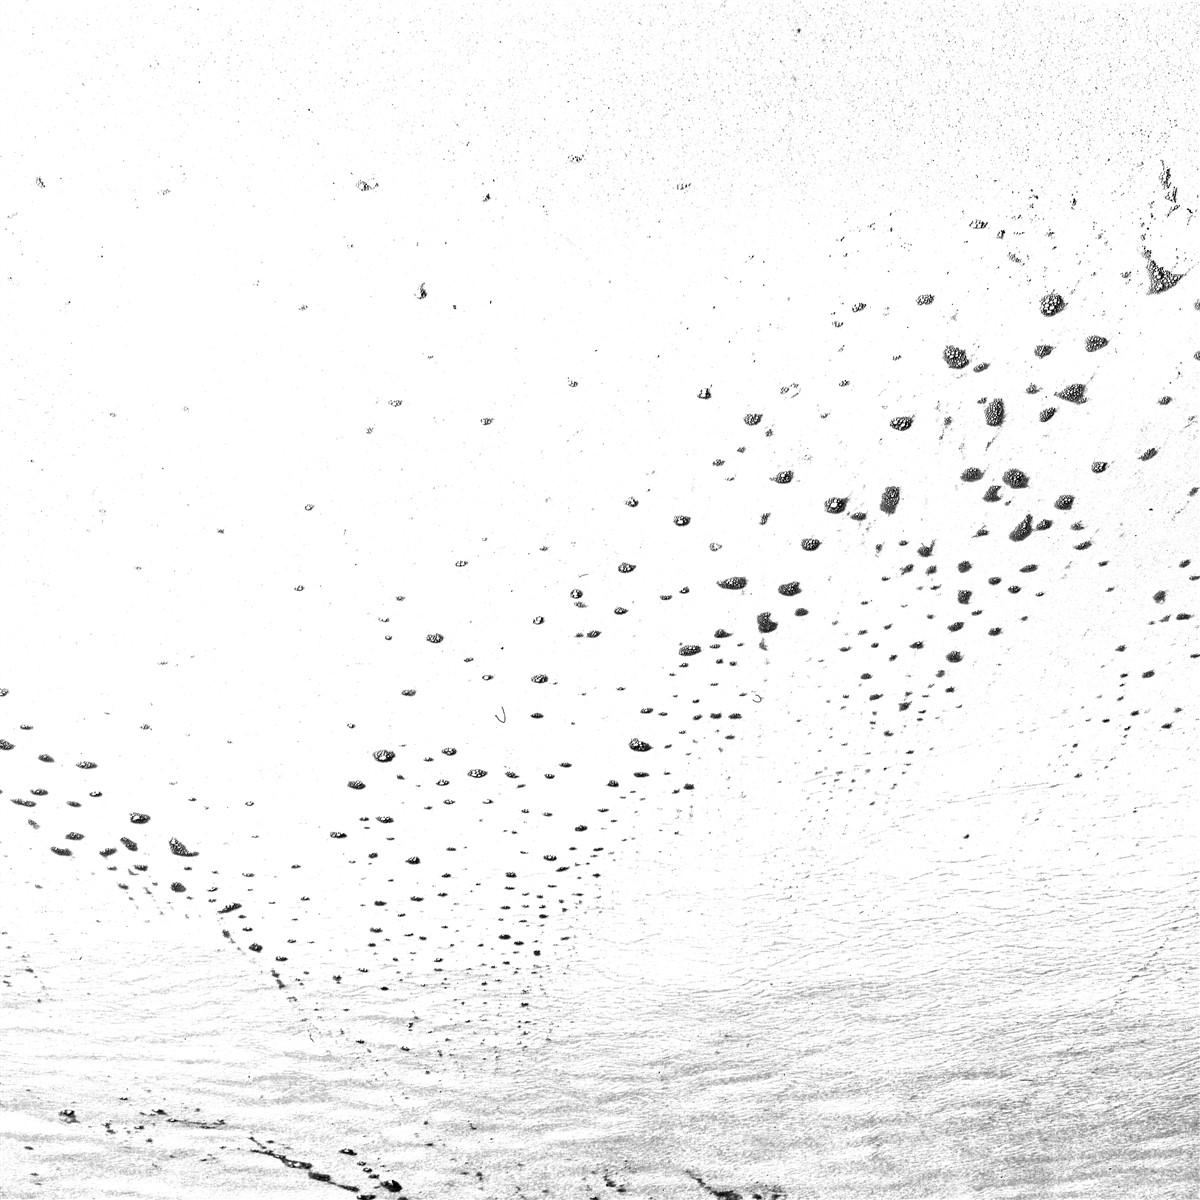 Riccardo Squillantini, Gas Geyser, Martian Age series